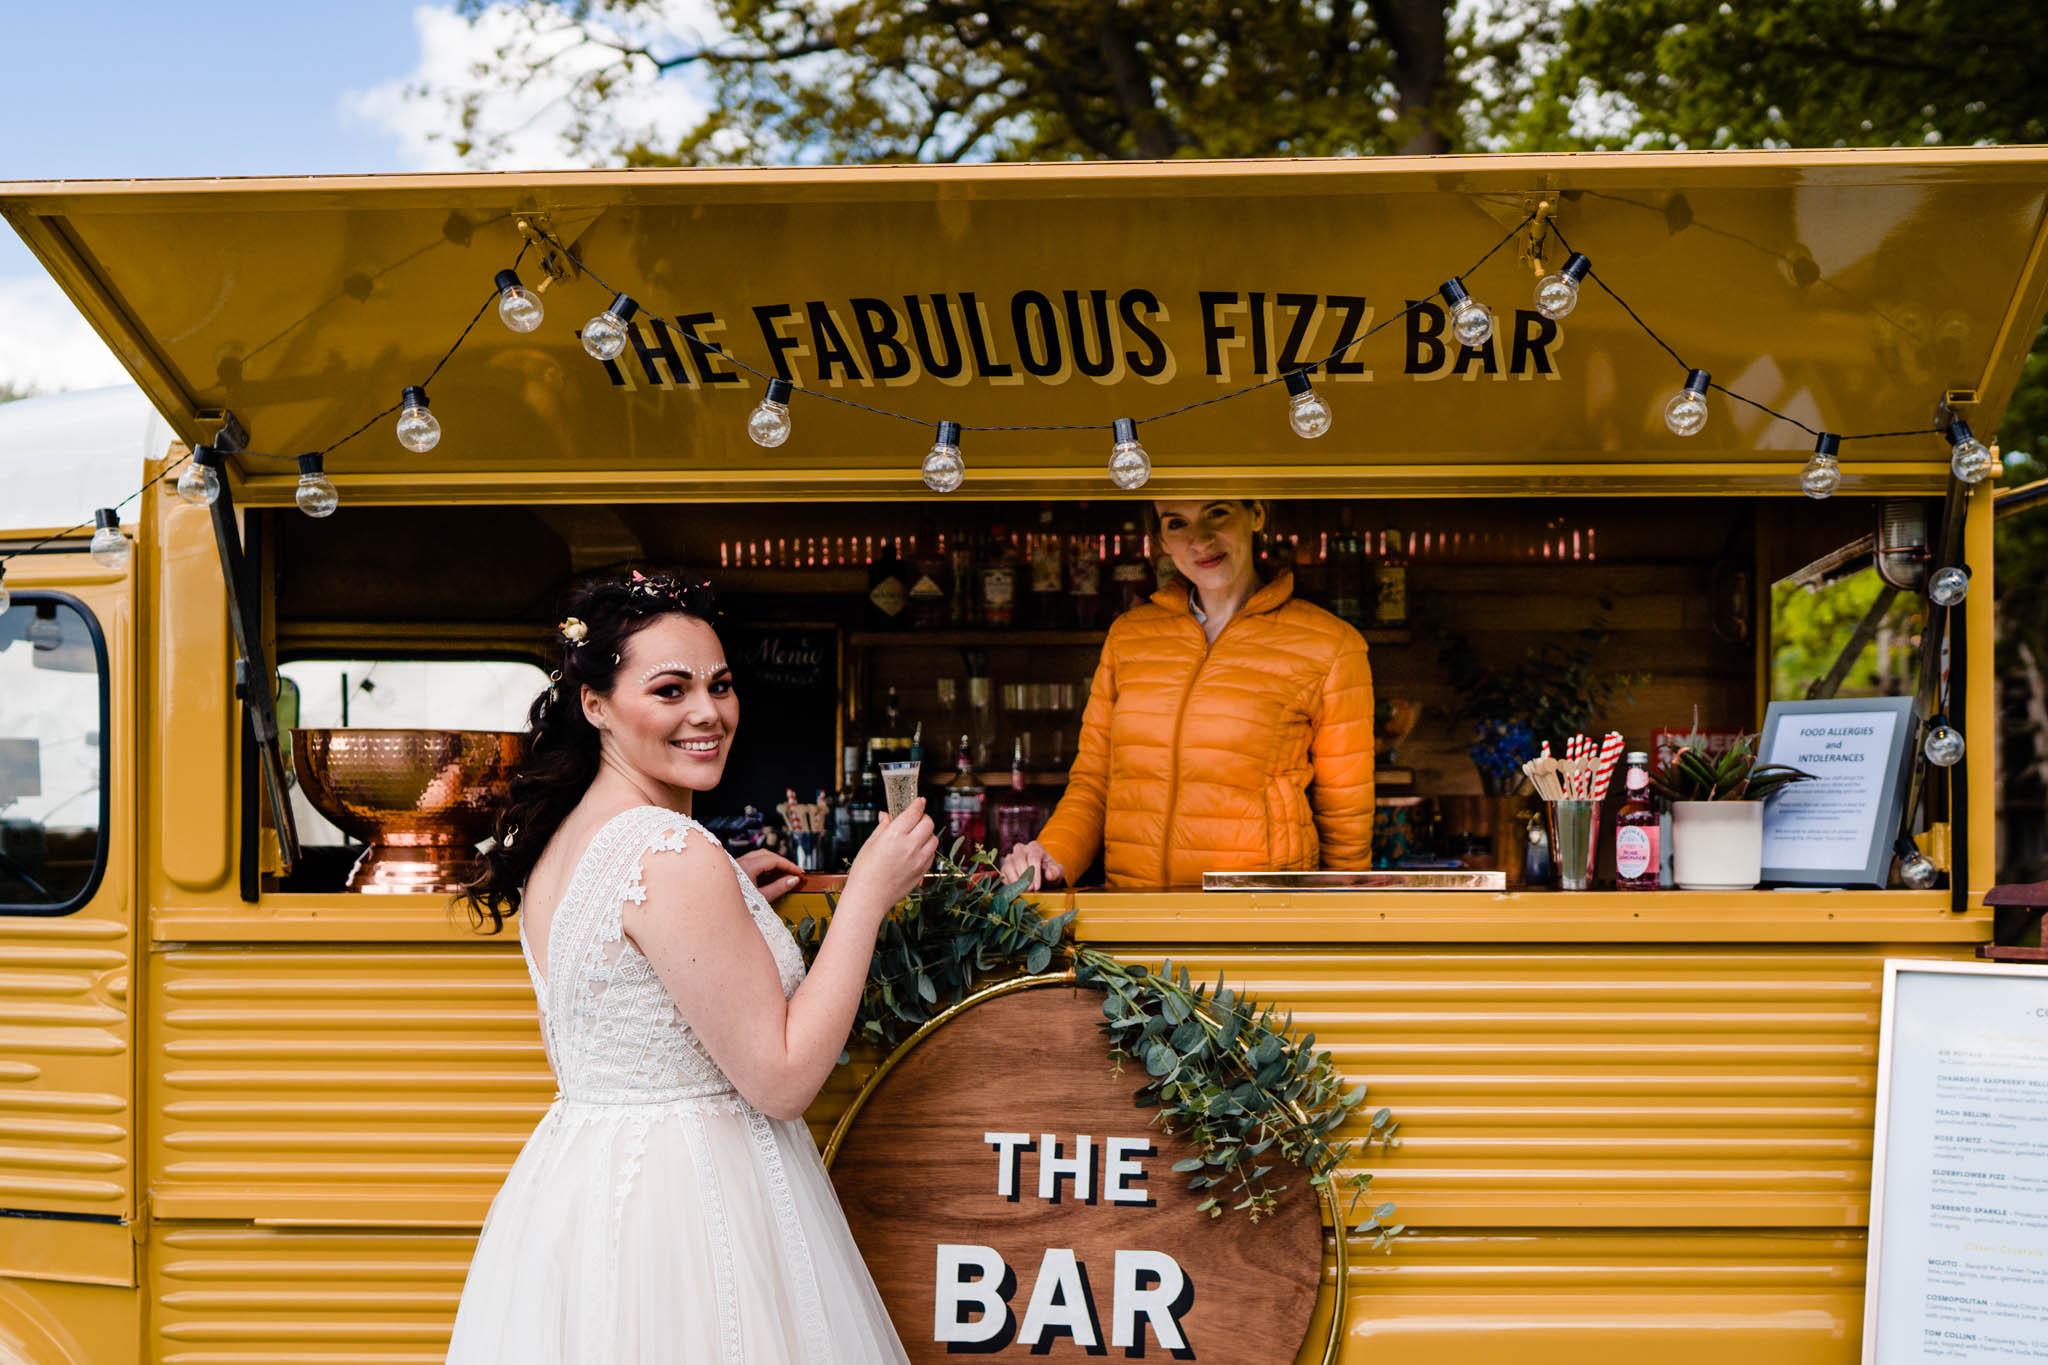 Festival wedding - Unconventional Wedding Festival - Fabulous Fizz Bar - Drink vans - vicki clayson photography 2